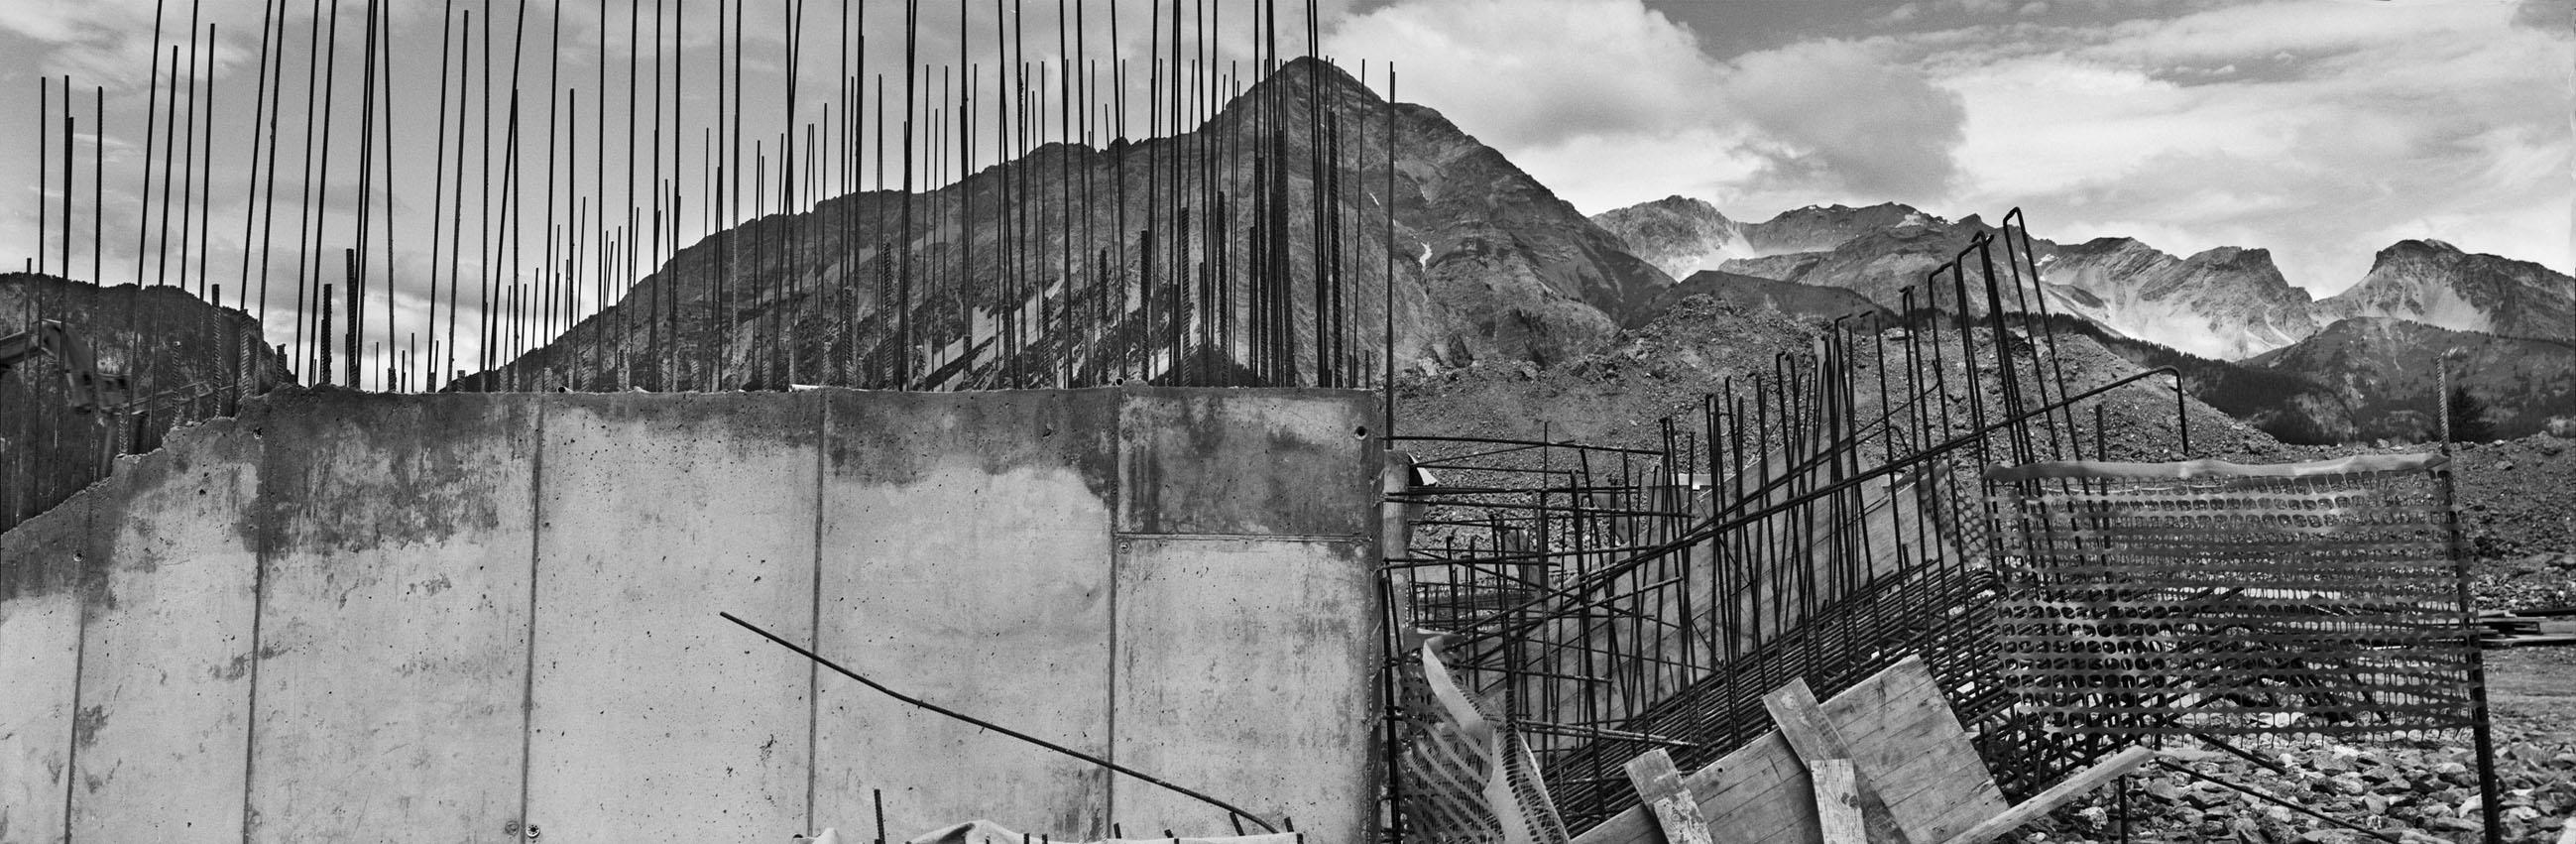 Josef Koudelka, ITALY. Piedmont. Province of Turin. Sansicario. 2004. Site of the Olympic Games.  © Josef Koudelka/Magnum Photos